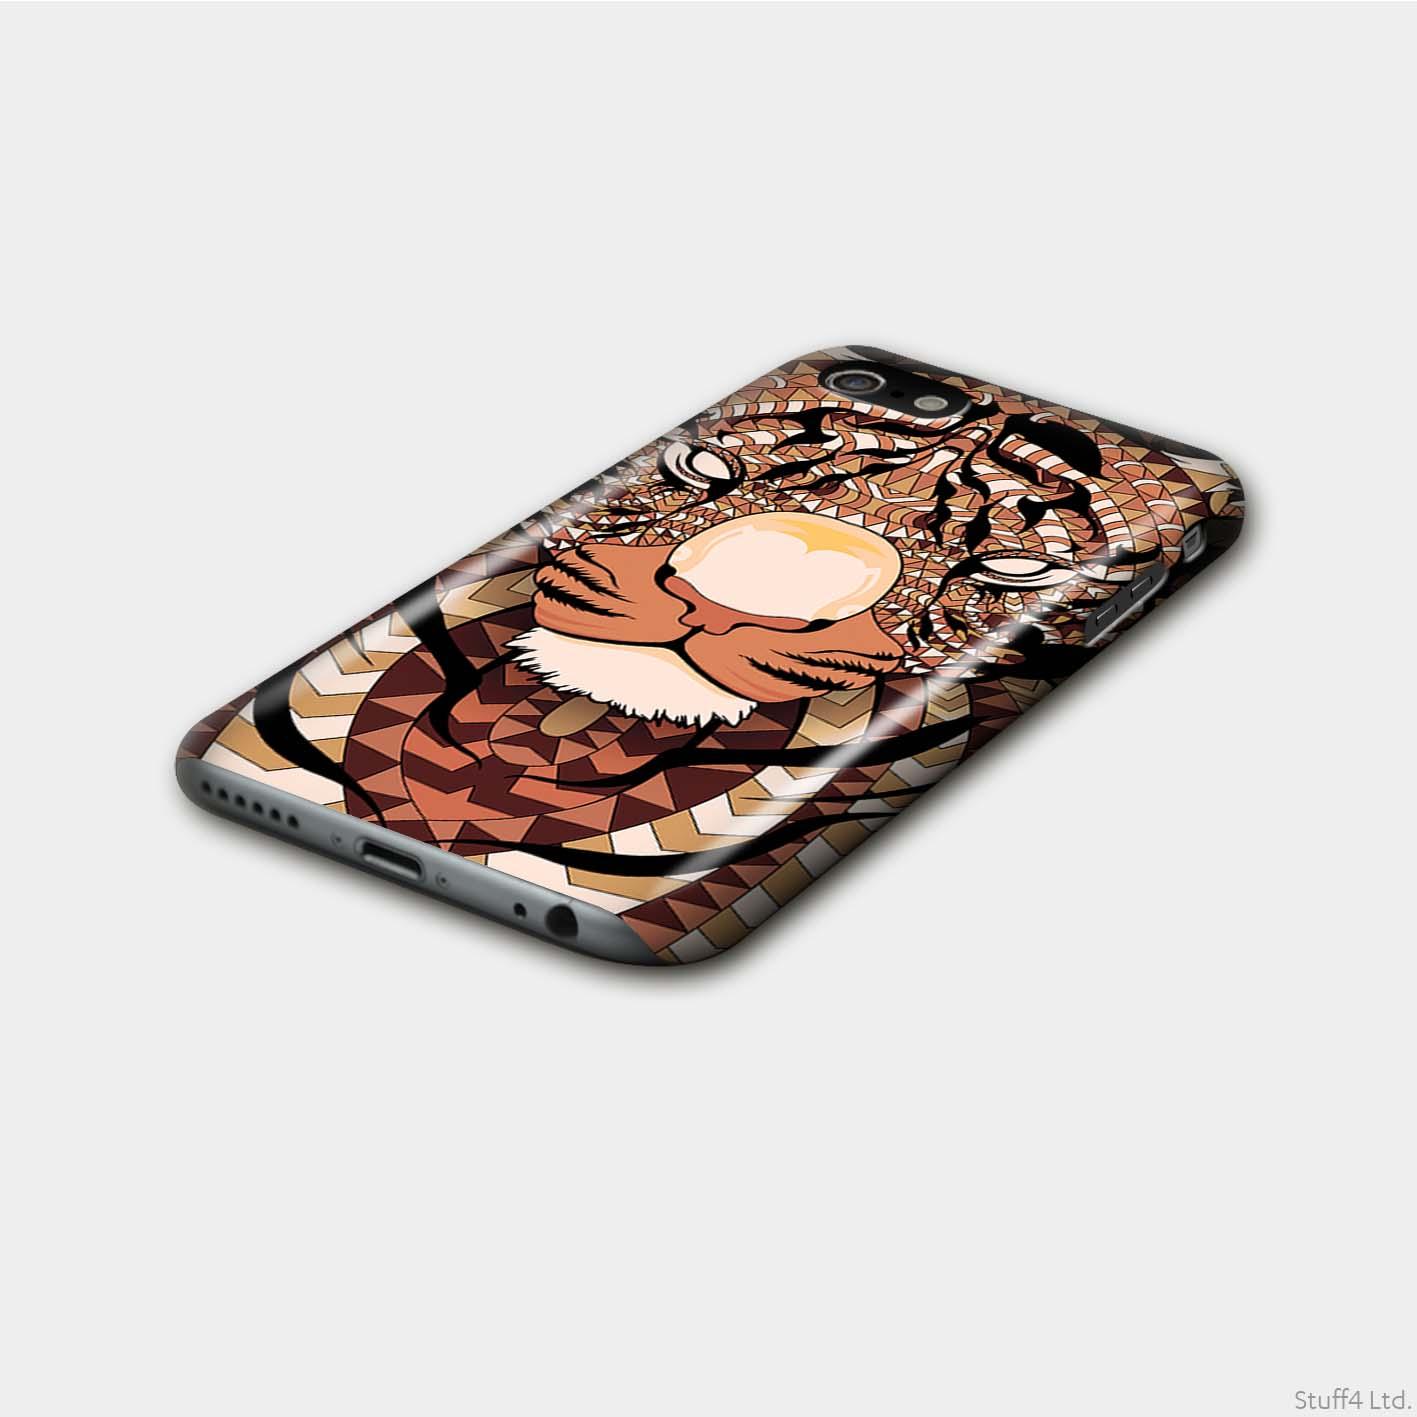 Gloss-Phone-Case-for-Apple-iPhone-X-10-Aztec-Animal-Design thumbnail 7